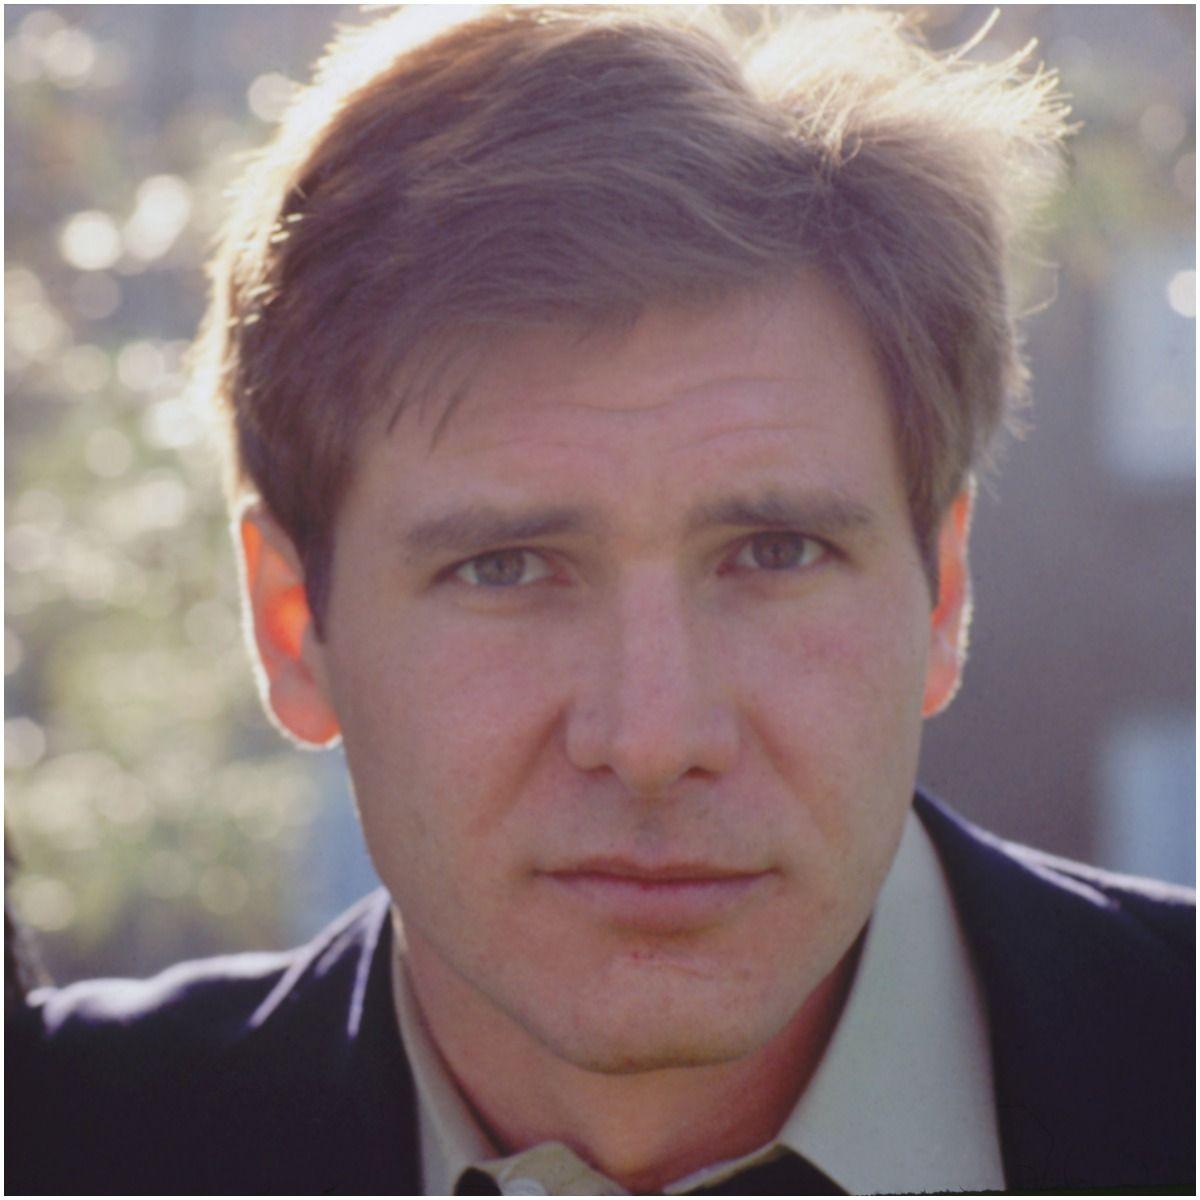 Harrison Ford green eyes